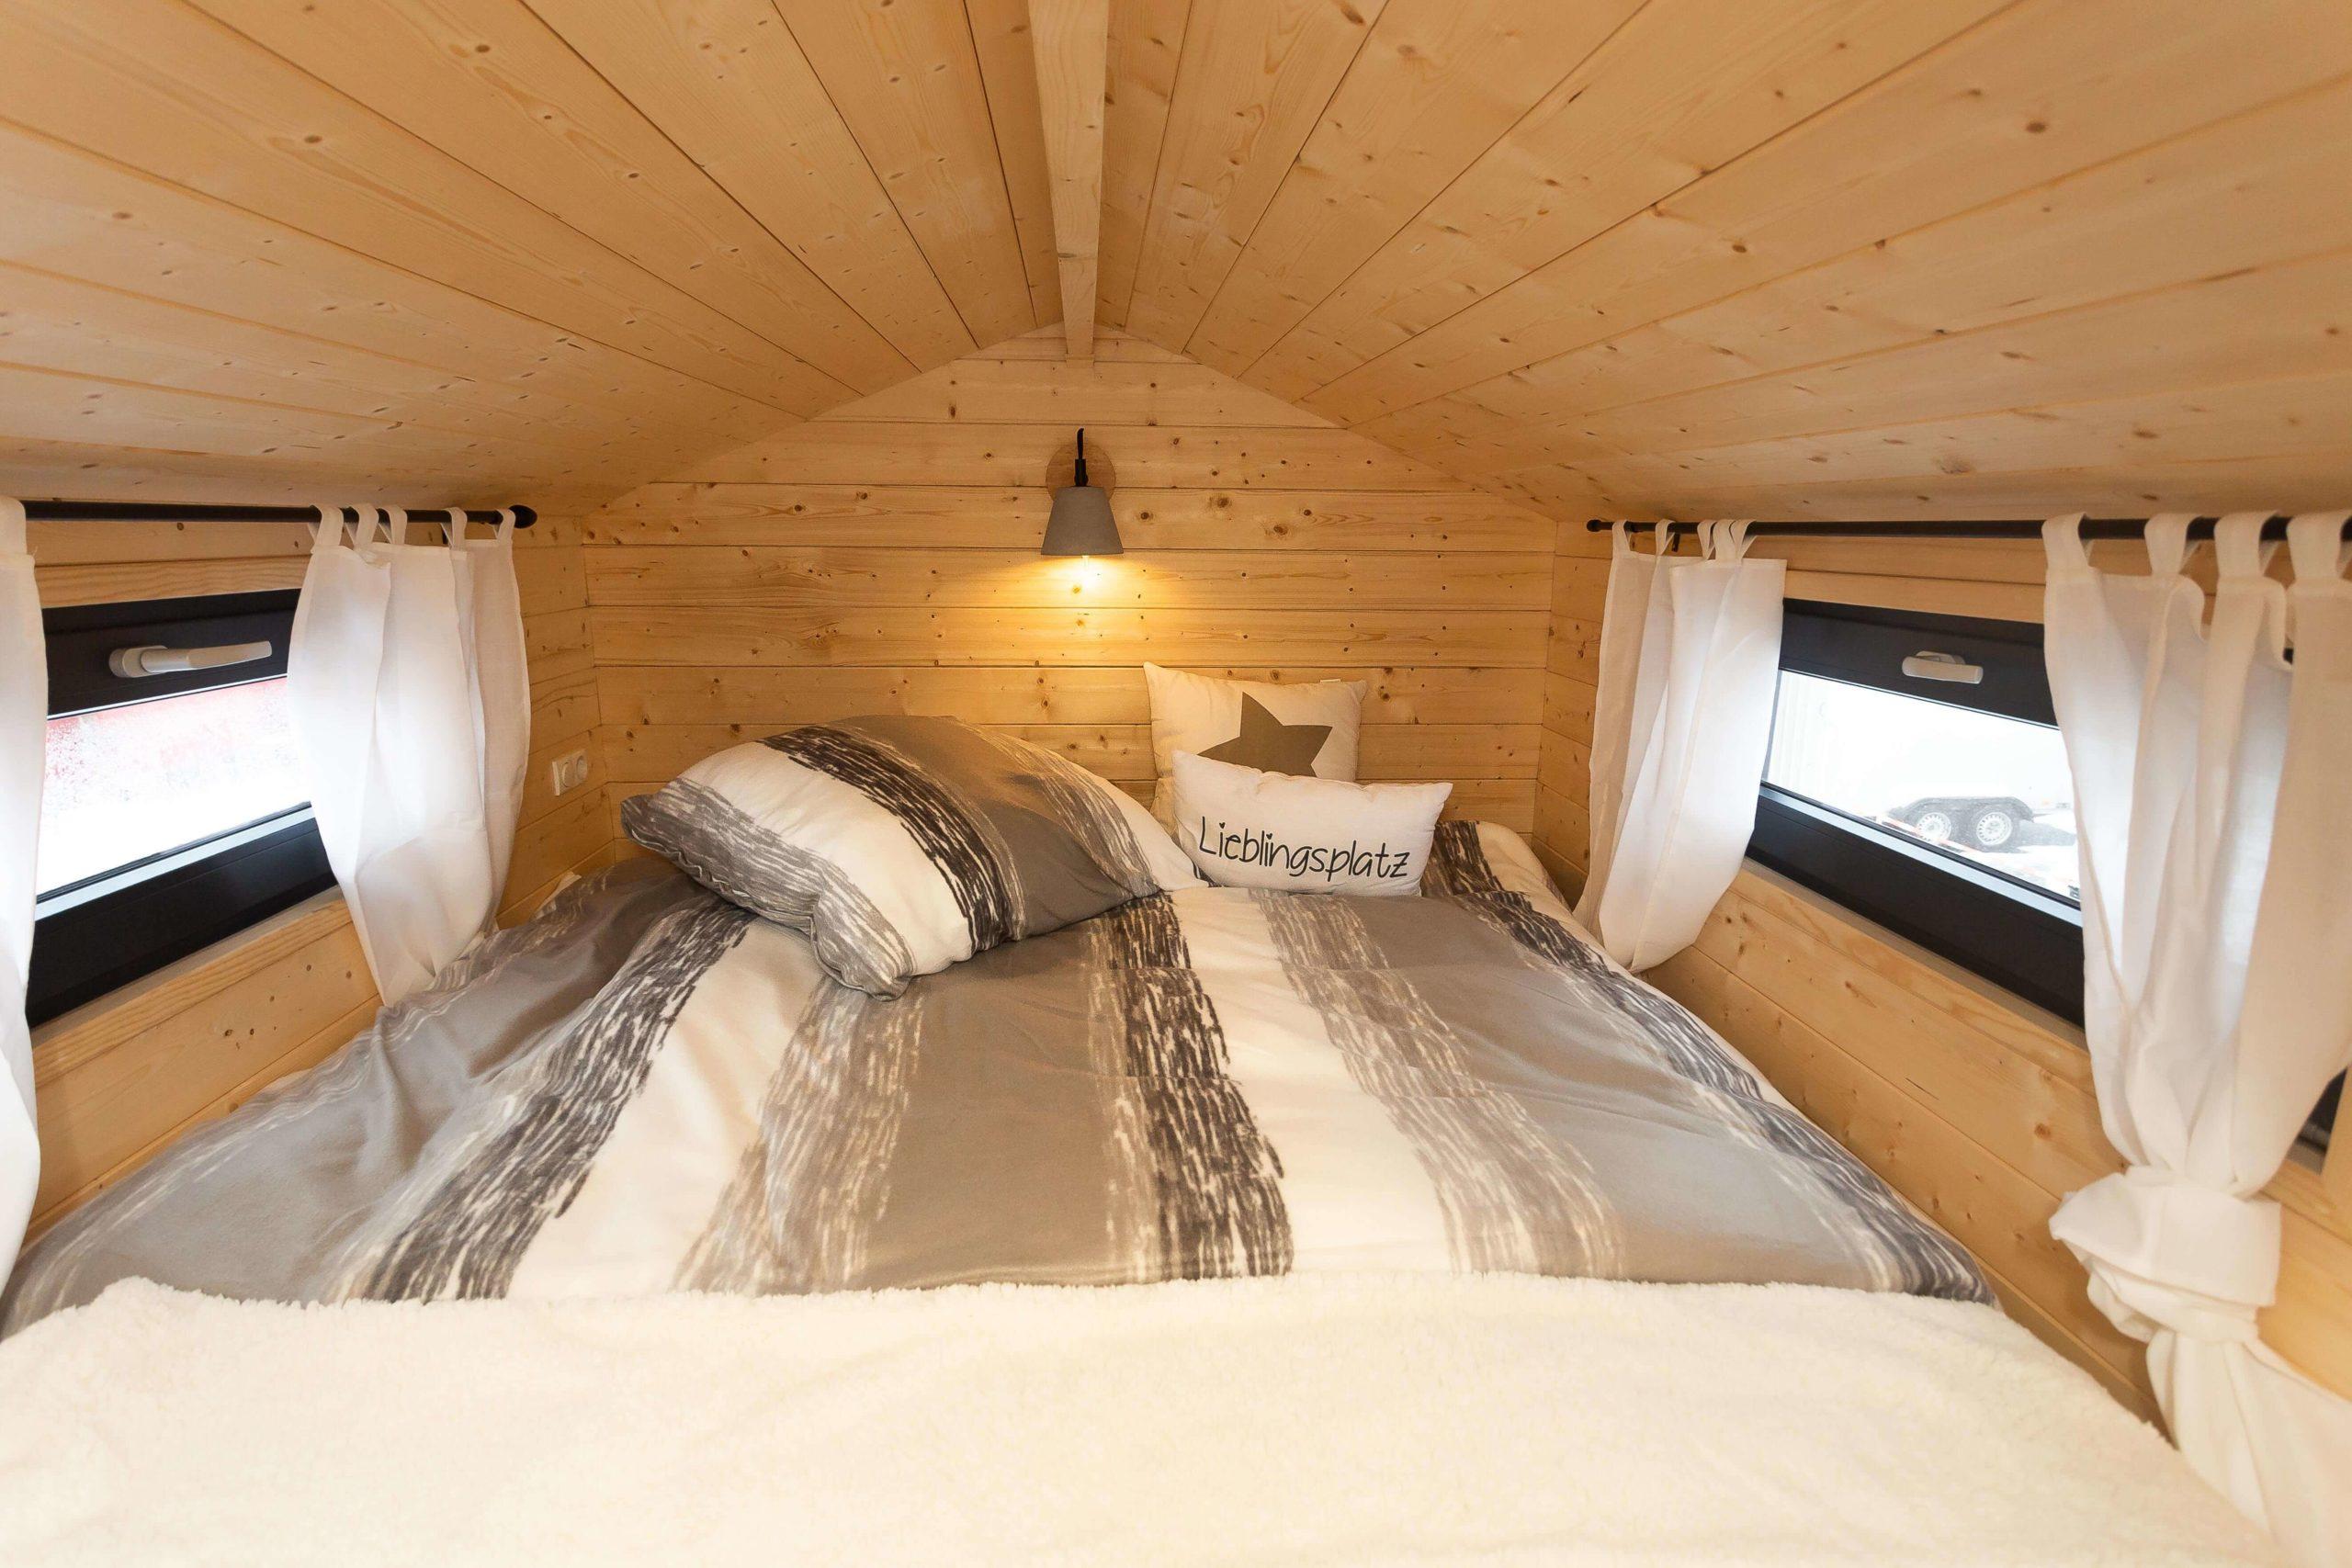 mobiles-tiny-house-australien-vital-camp-gmbh-21